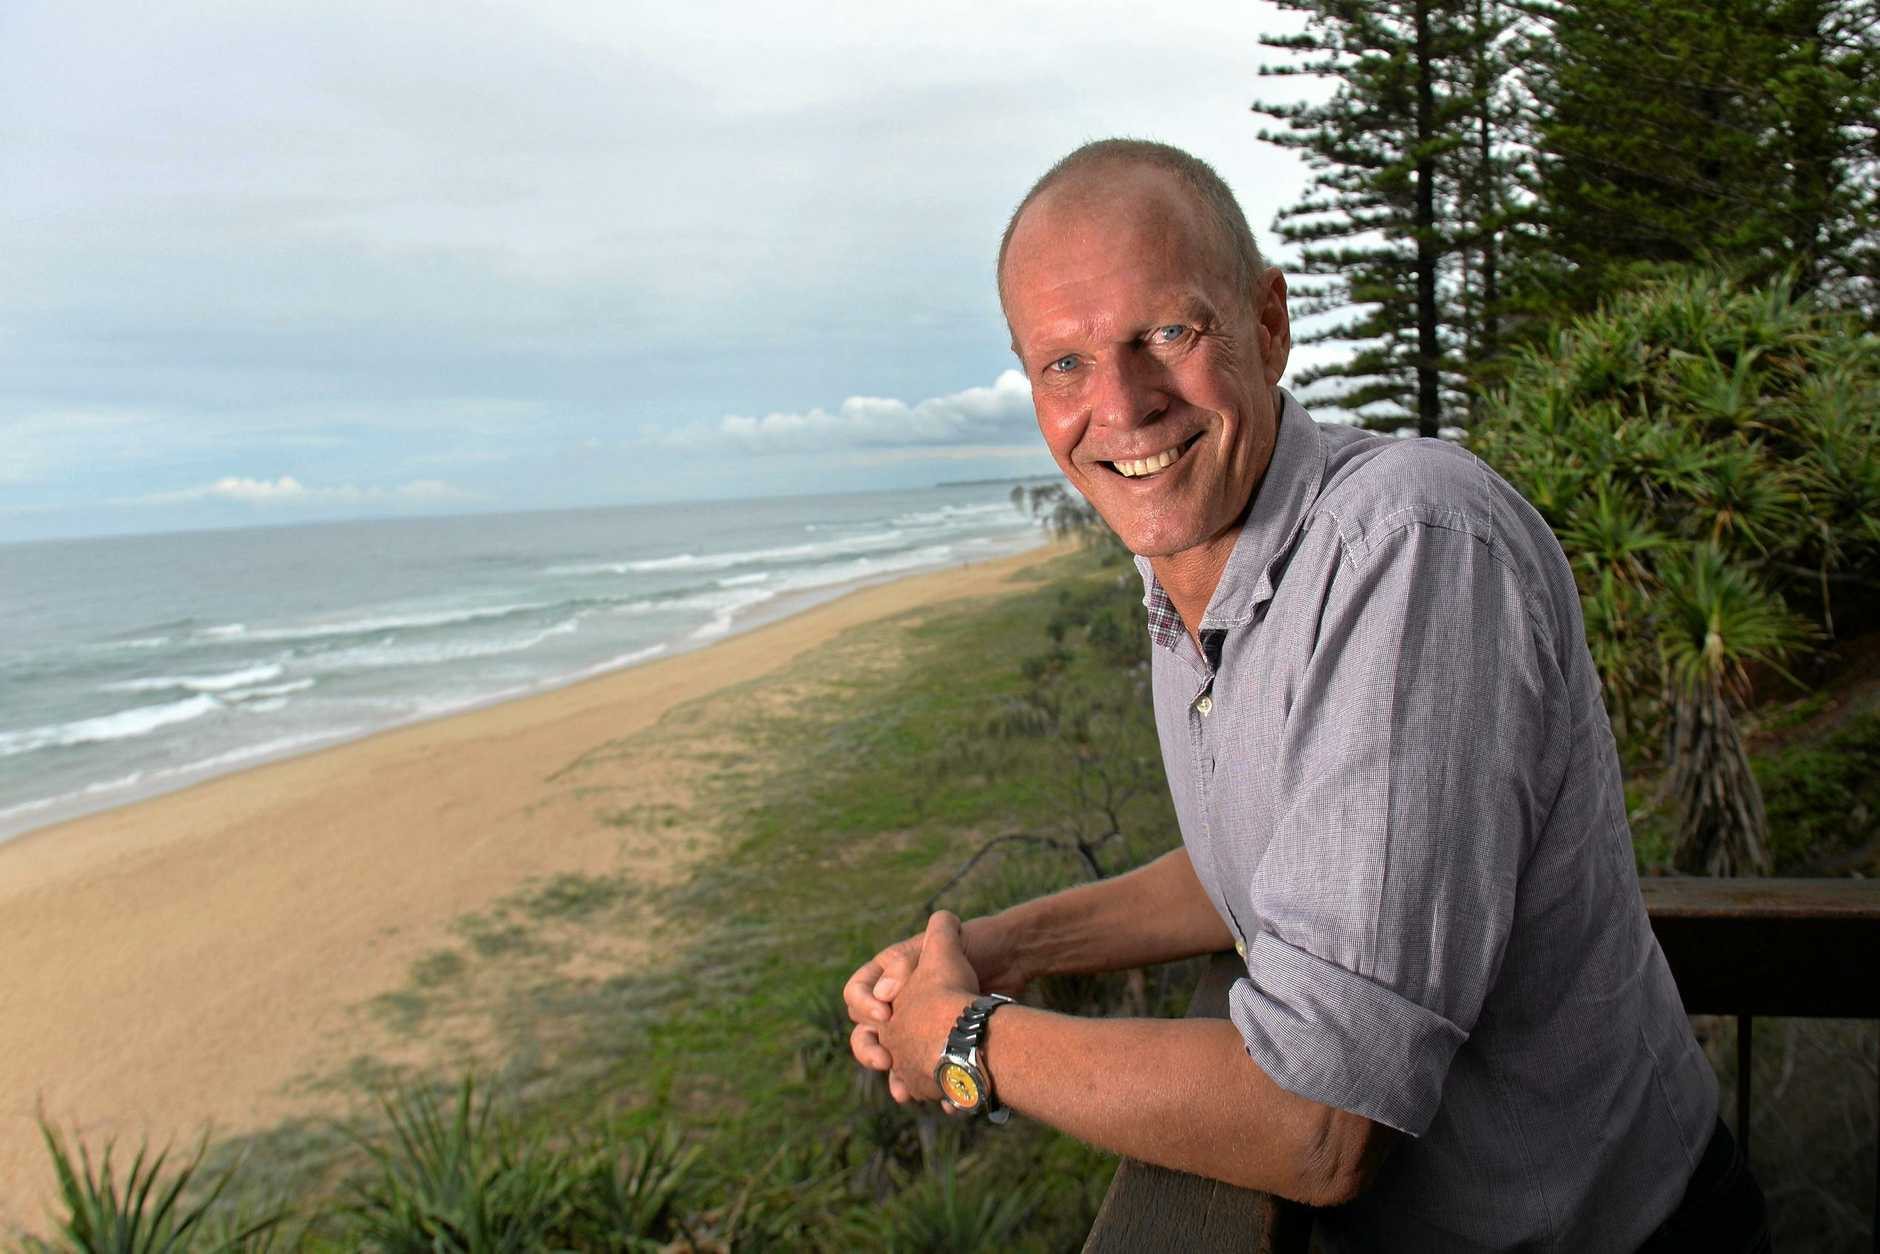 Gordon Barratt is the founder of a new program for at-risk kids on the Sunshine Coast.